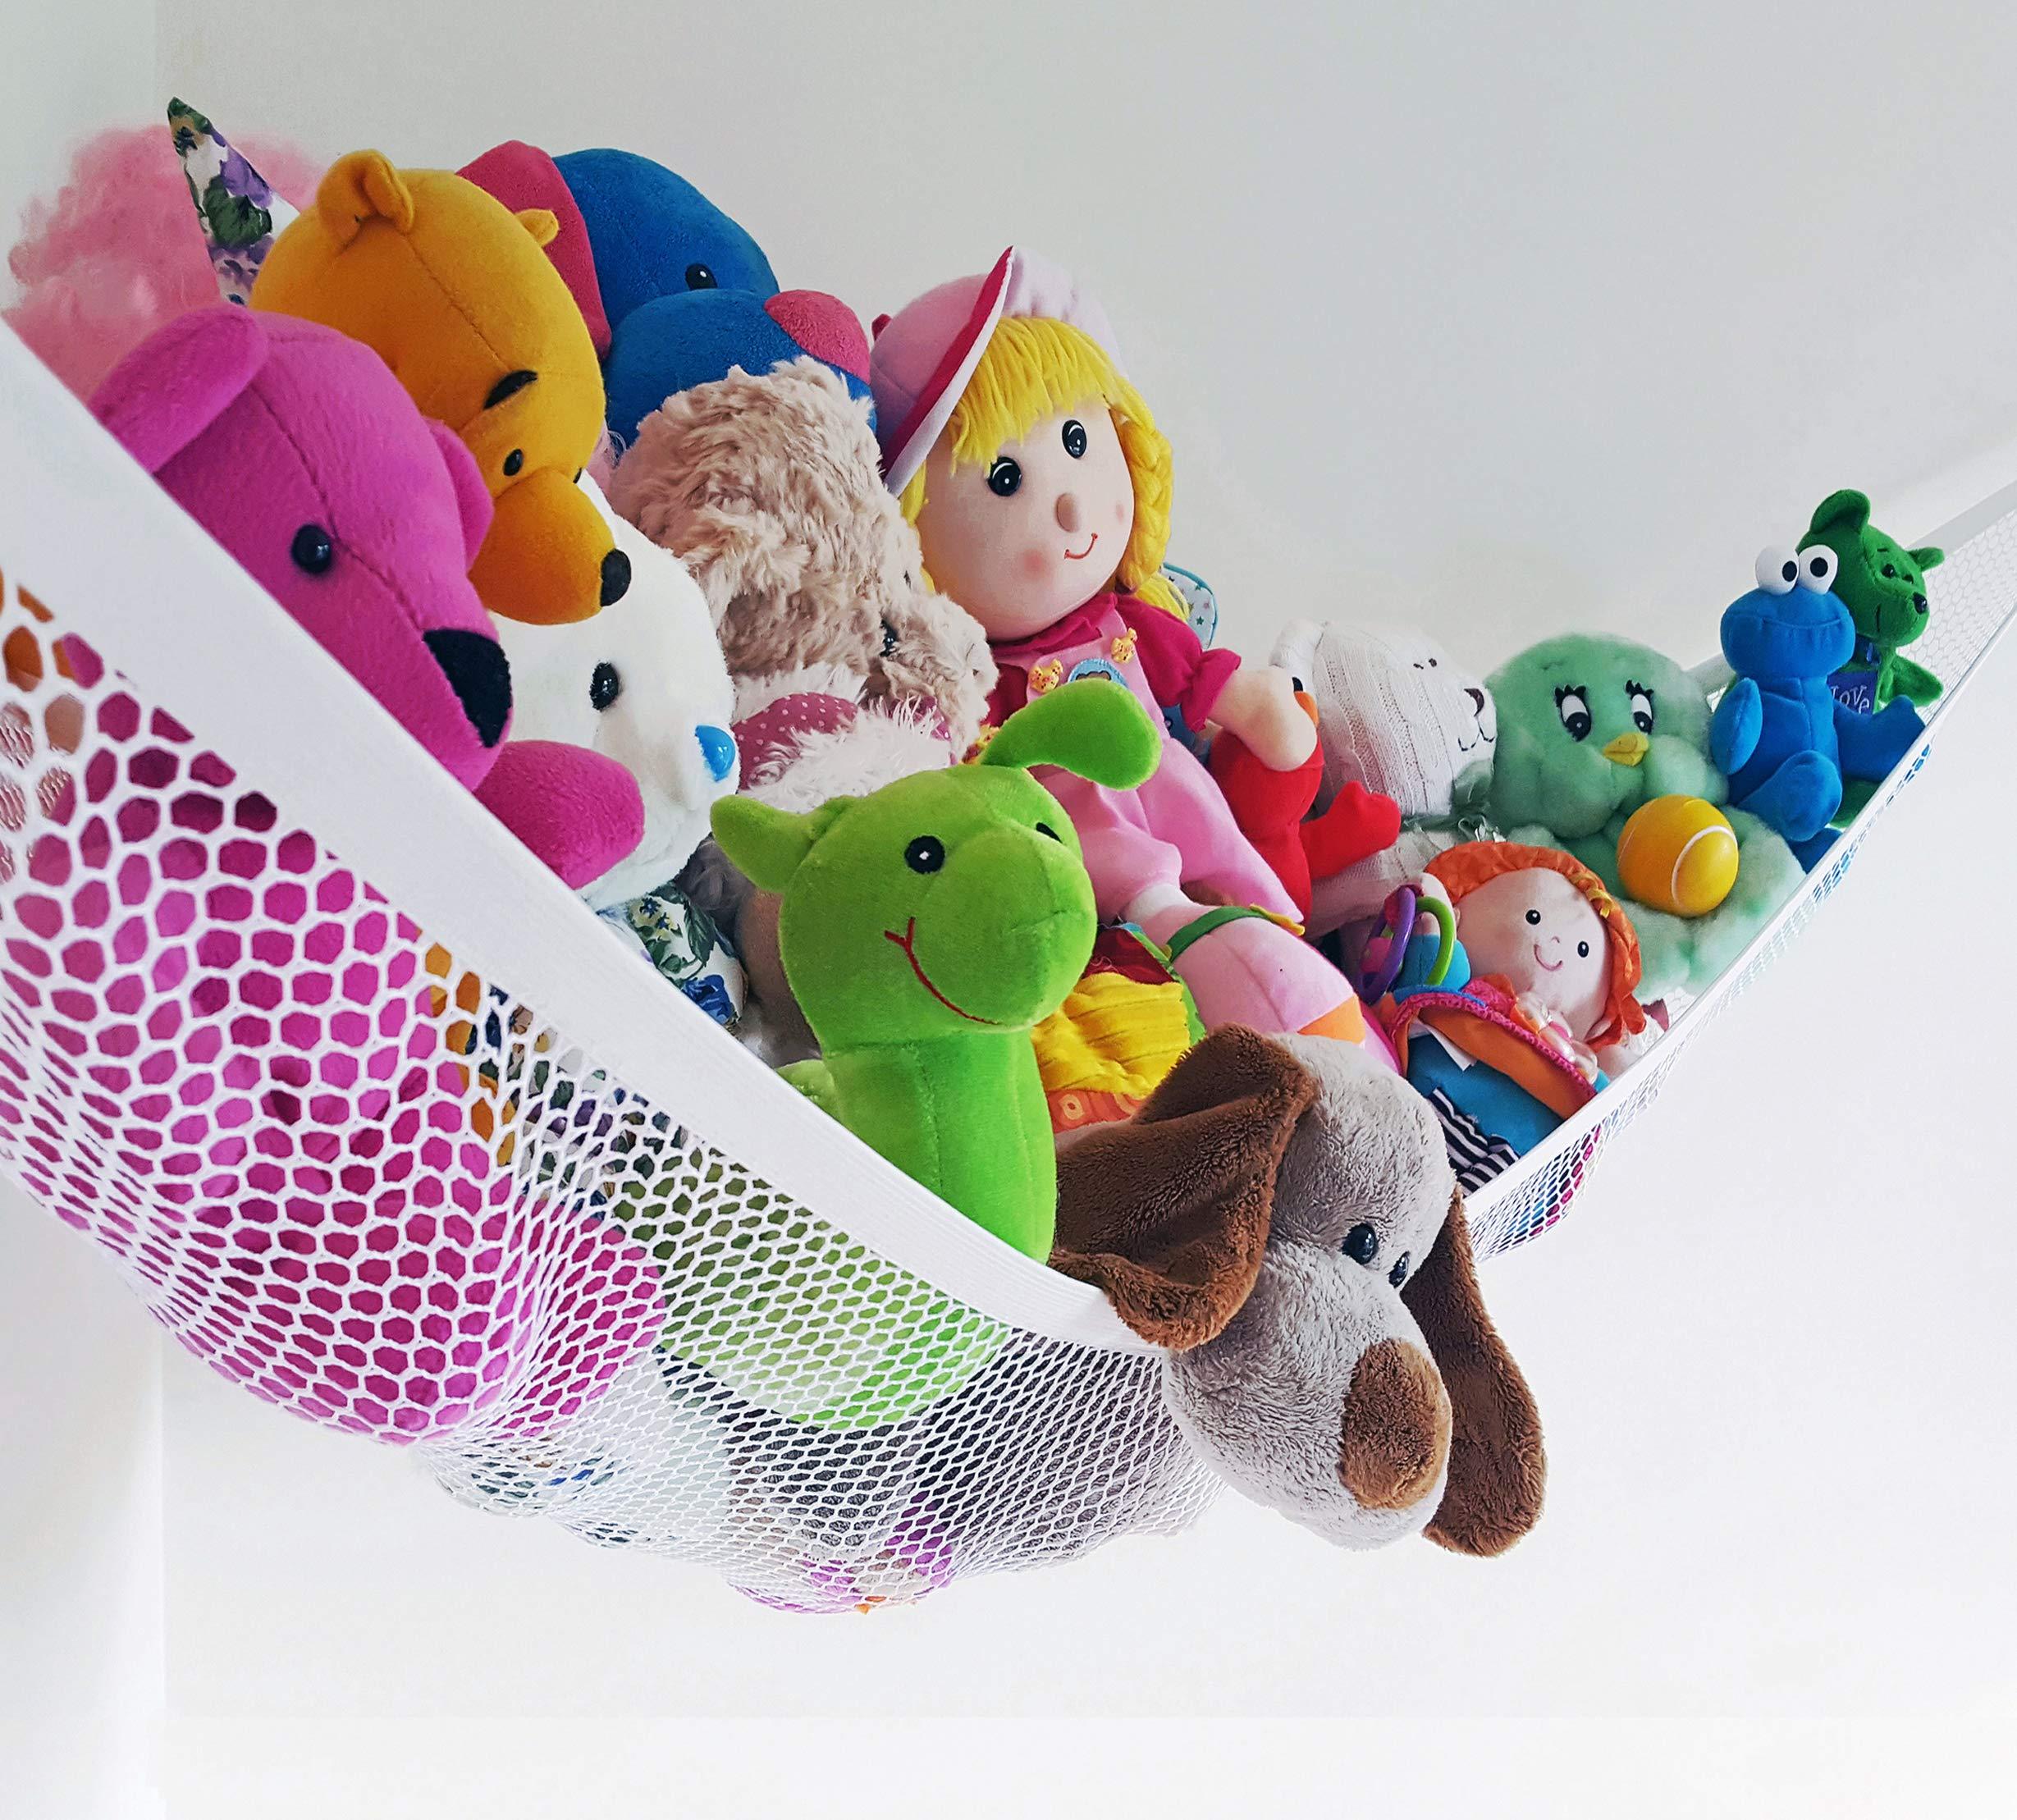 Jumbo Stuffed Animal Hammock, Corner Storage Net Organizer for Kids Toys, Games, Nursery, White by Viva Toy Hammock